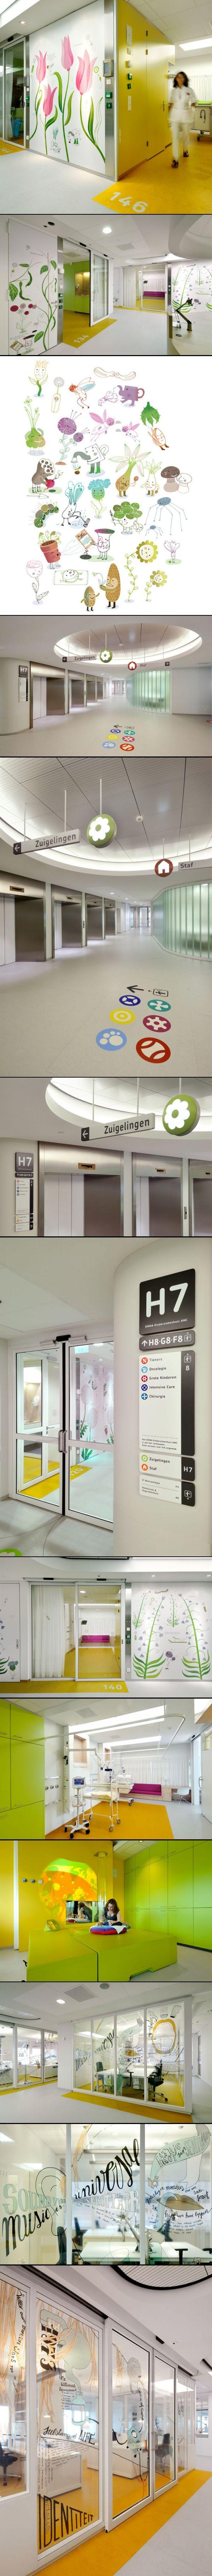 Emma Children's Hospital EKZ, Netherlands - Healthcare Interiors - Wayfinding, Orientation and Art - Healing Environmental Design